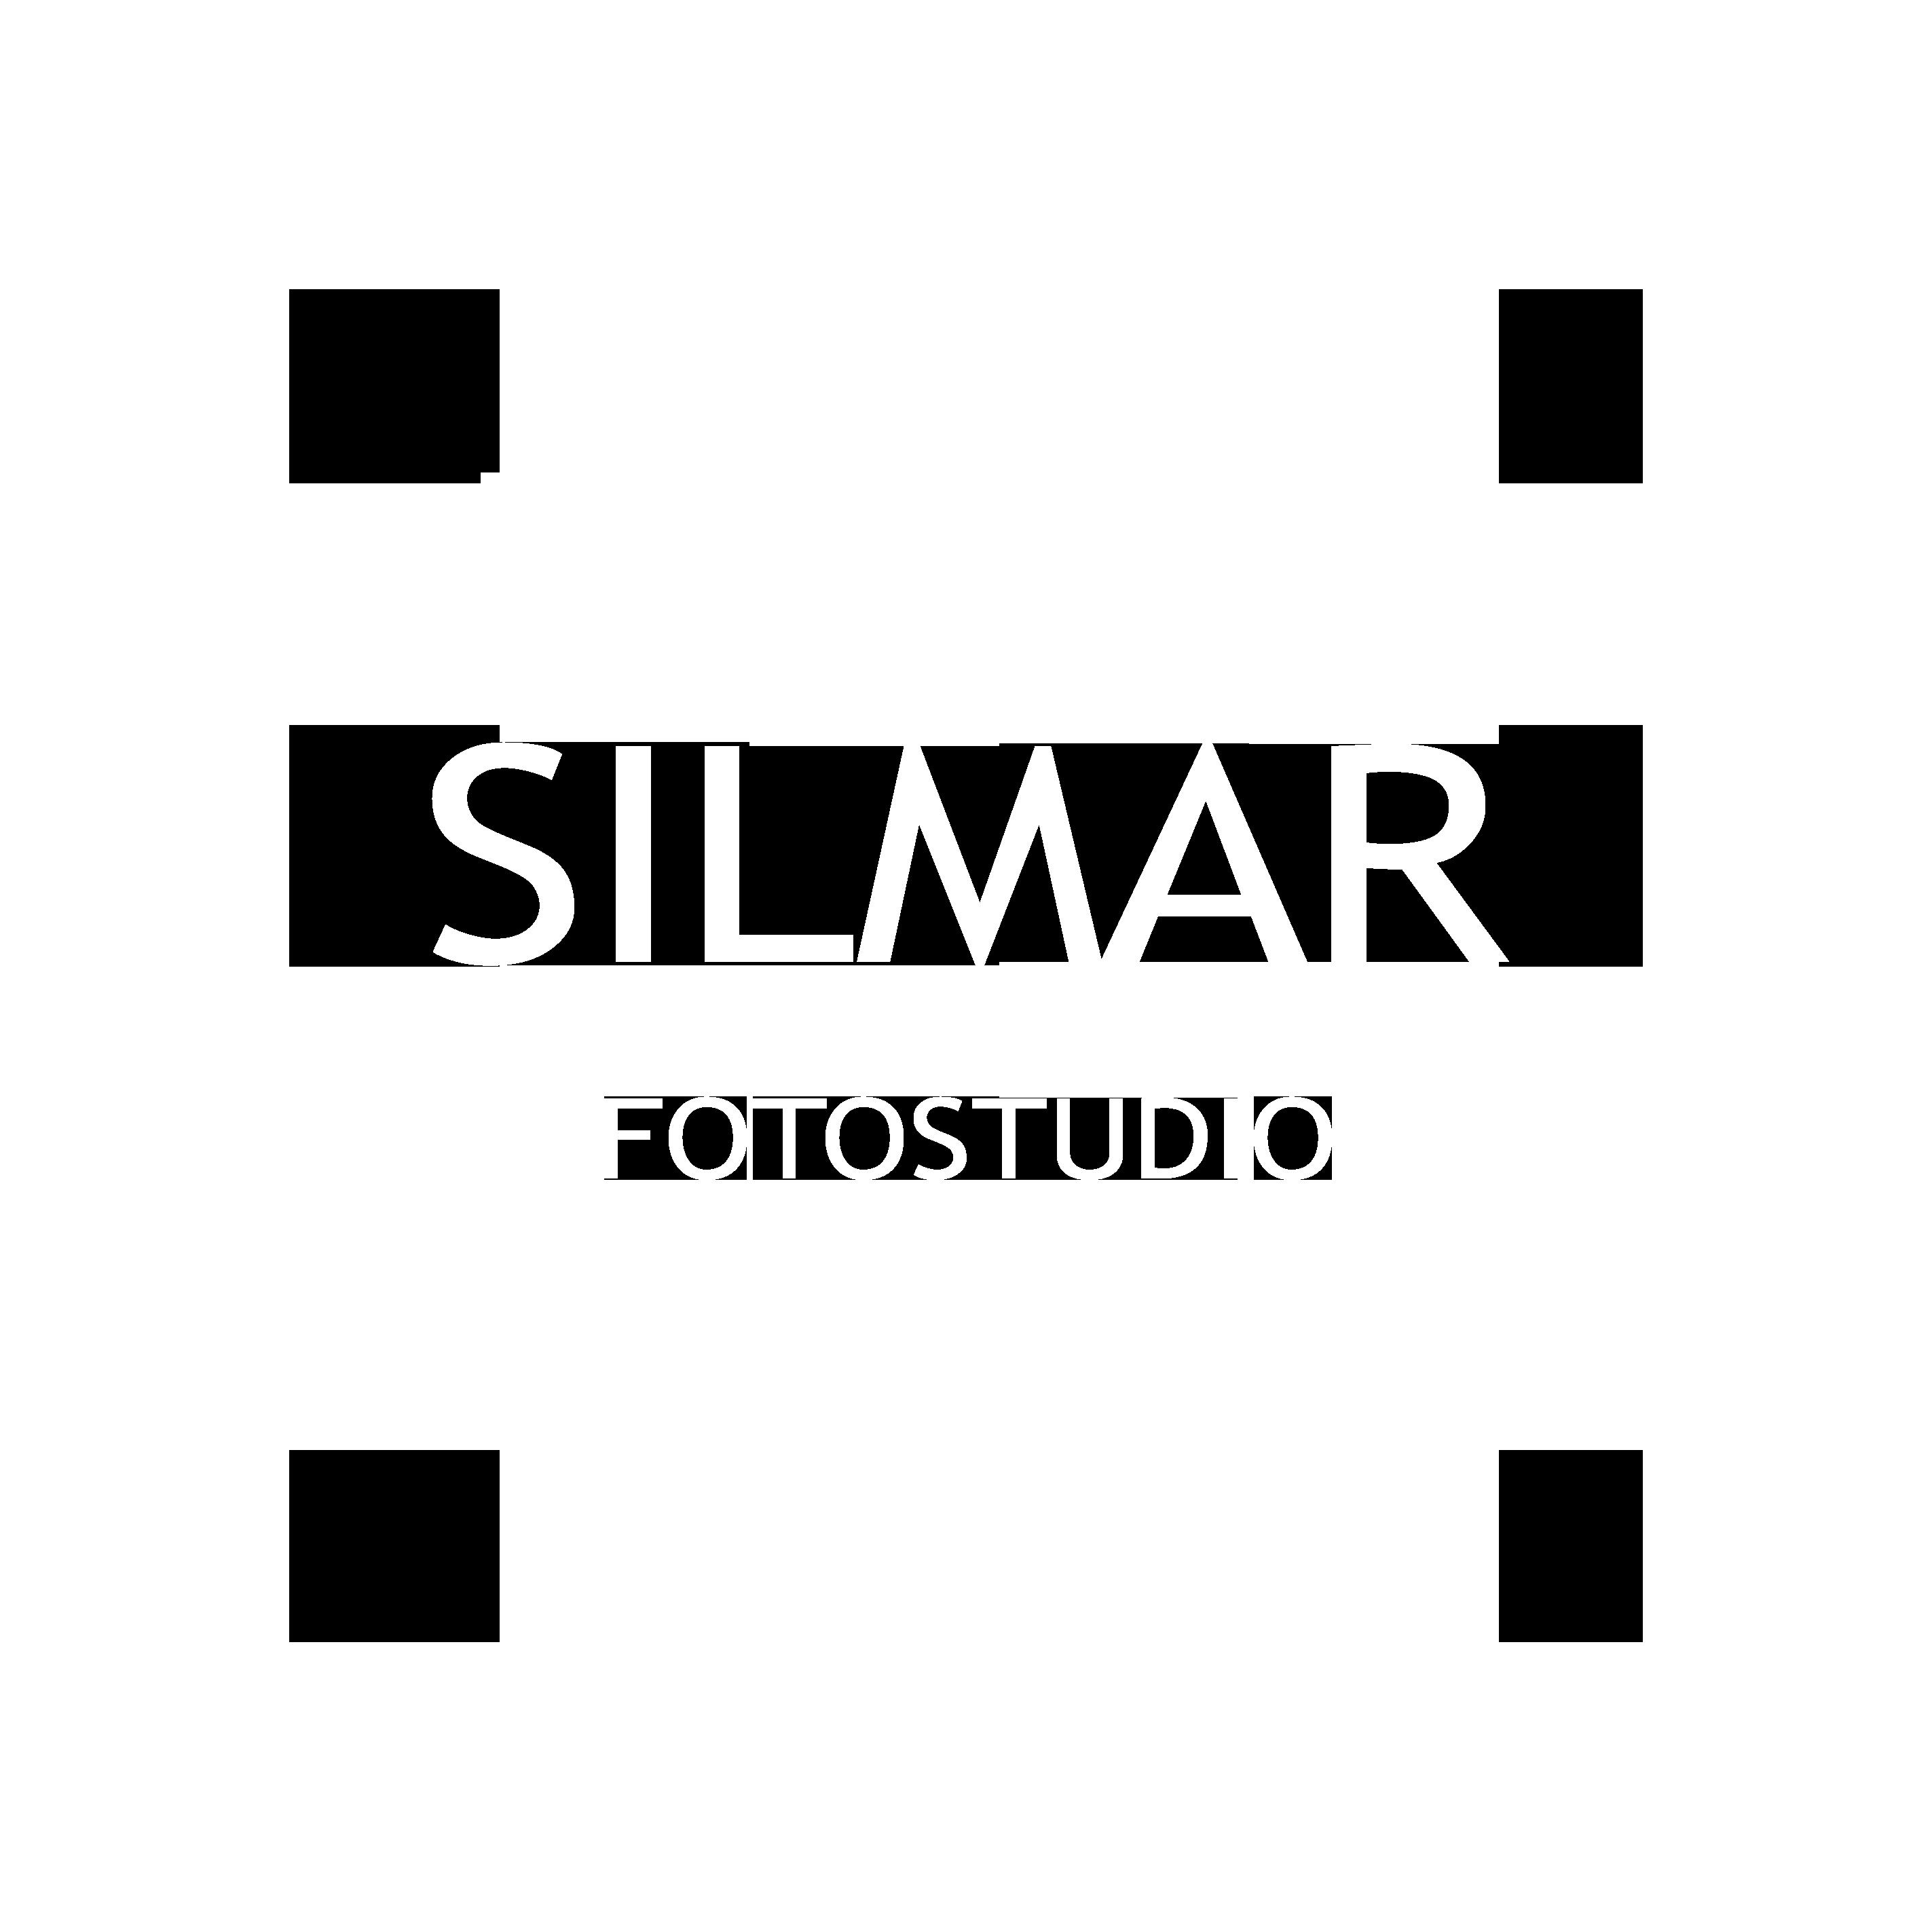 Fotostudio Silmar